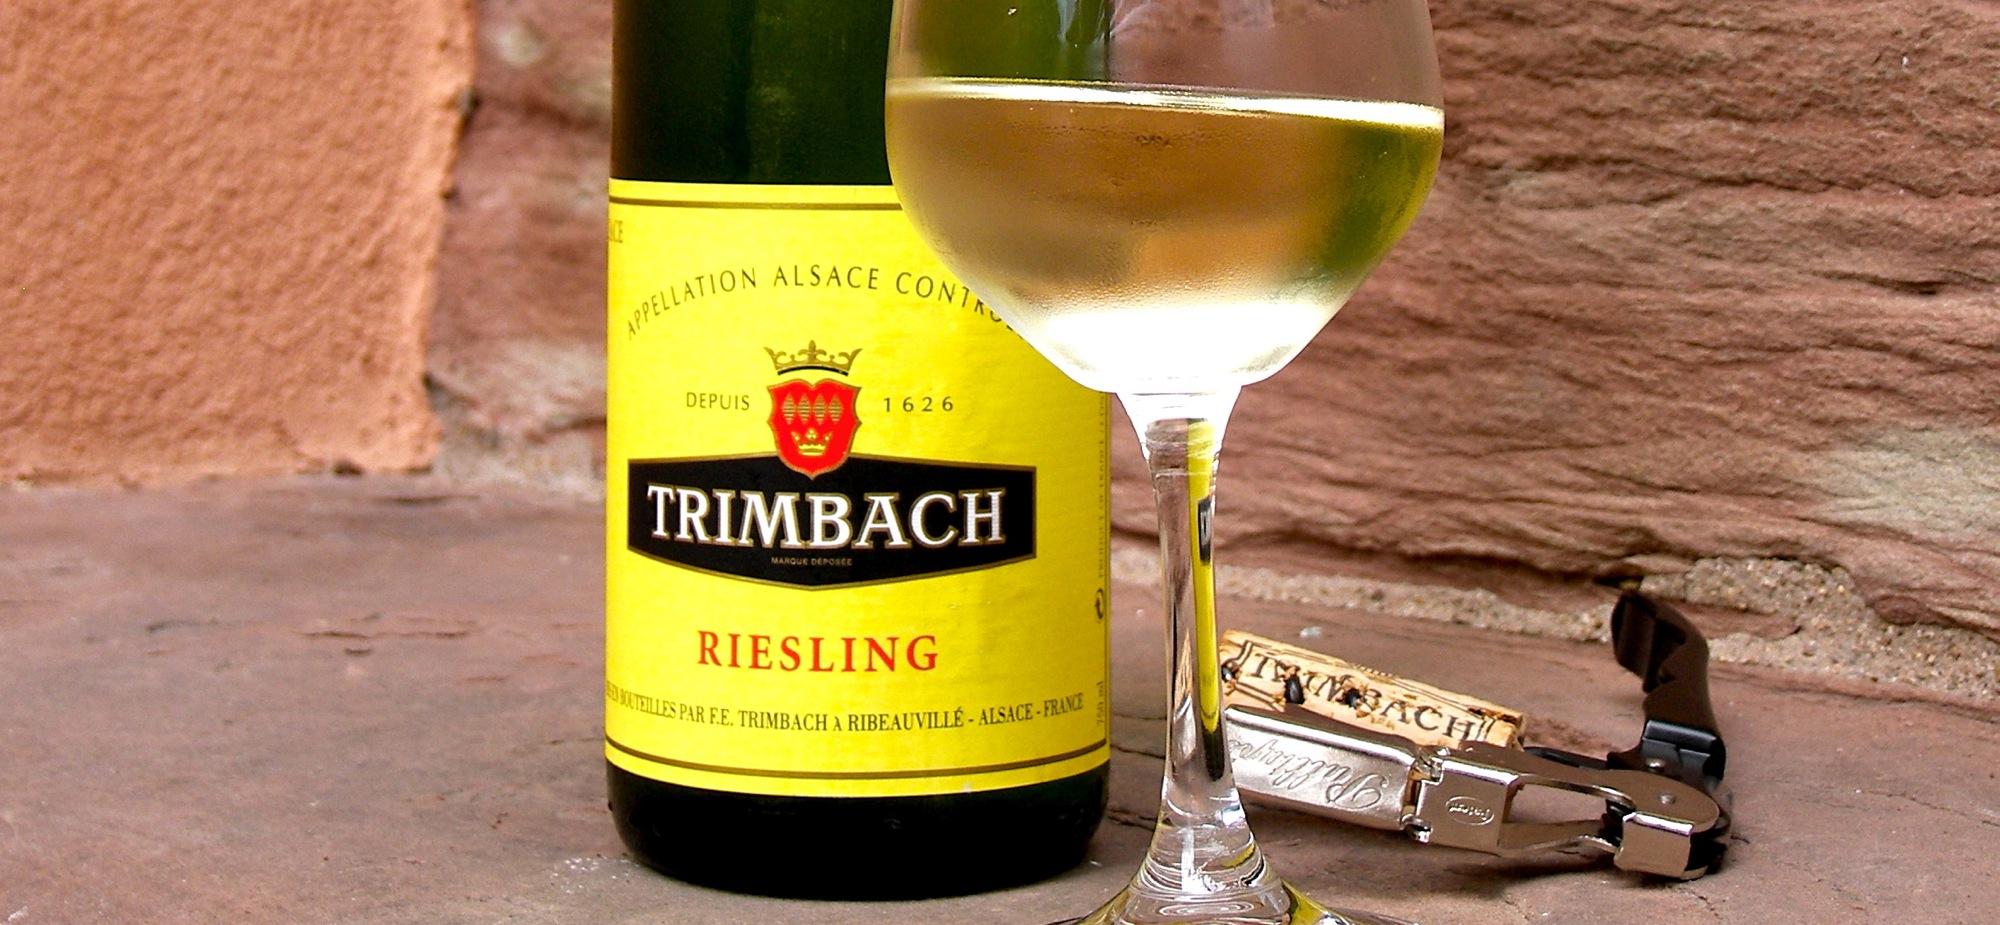 slideshow-trimbach-4_-30-08-2020-17-06-42.jpg